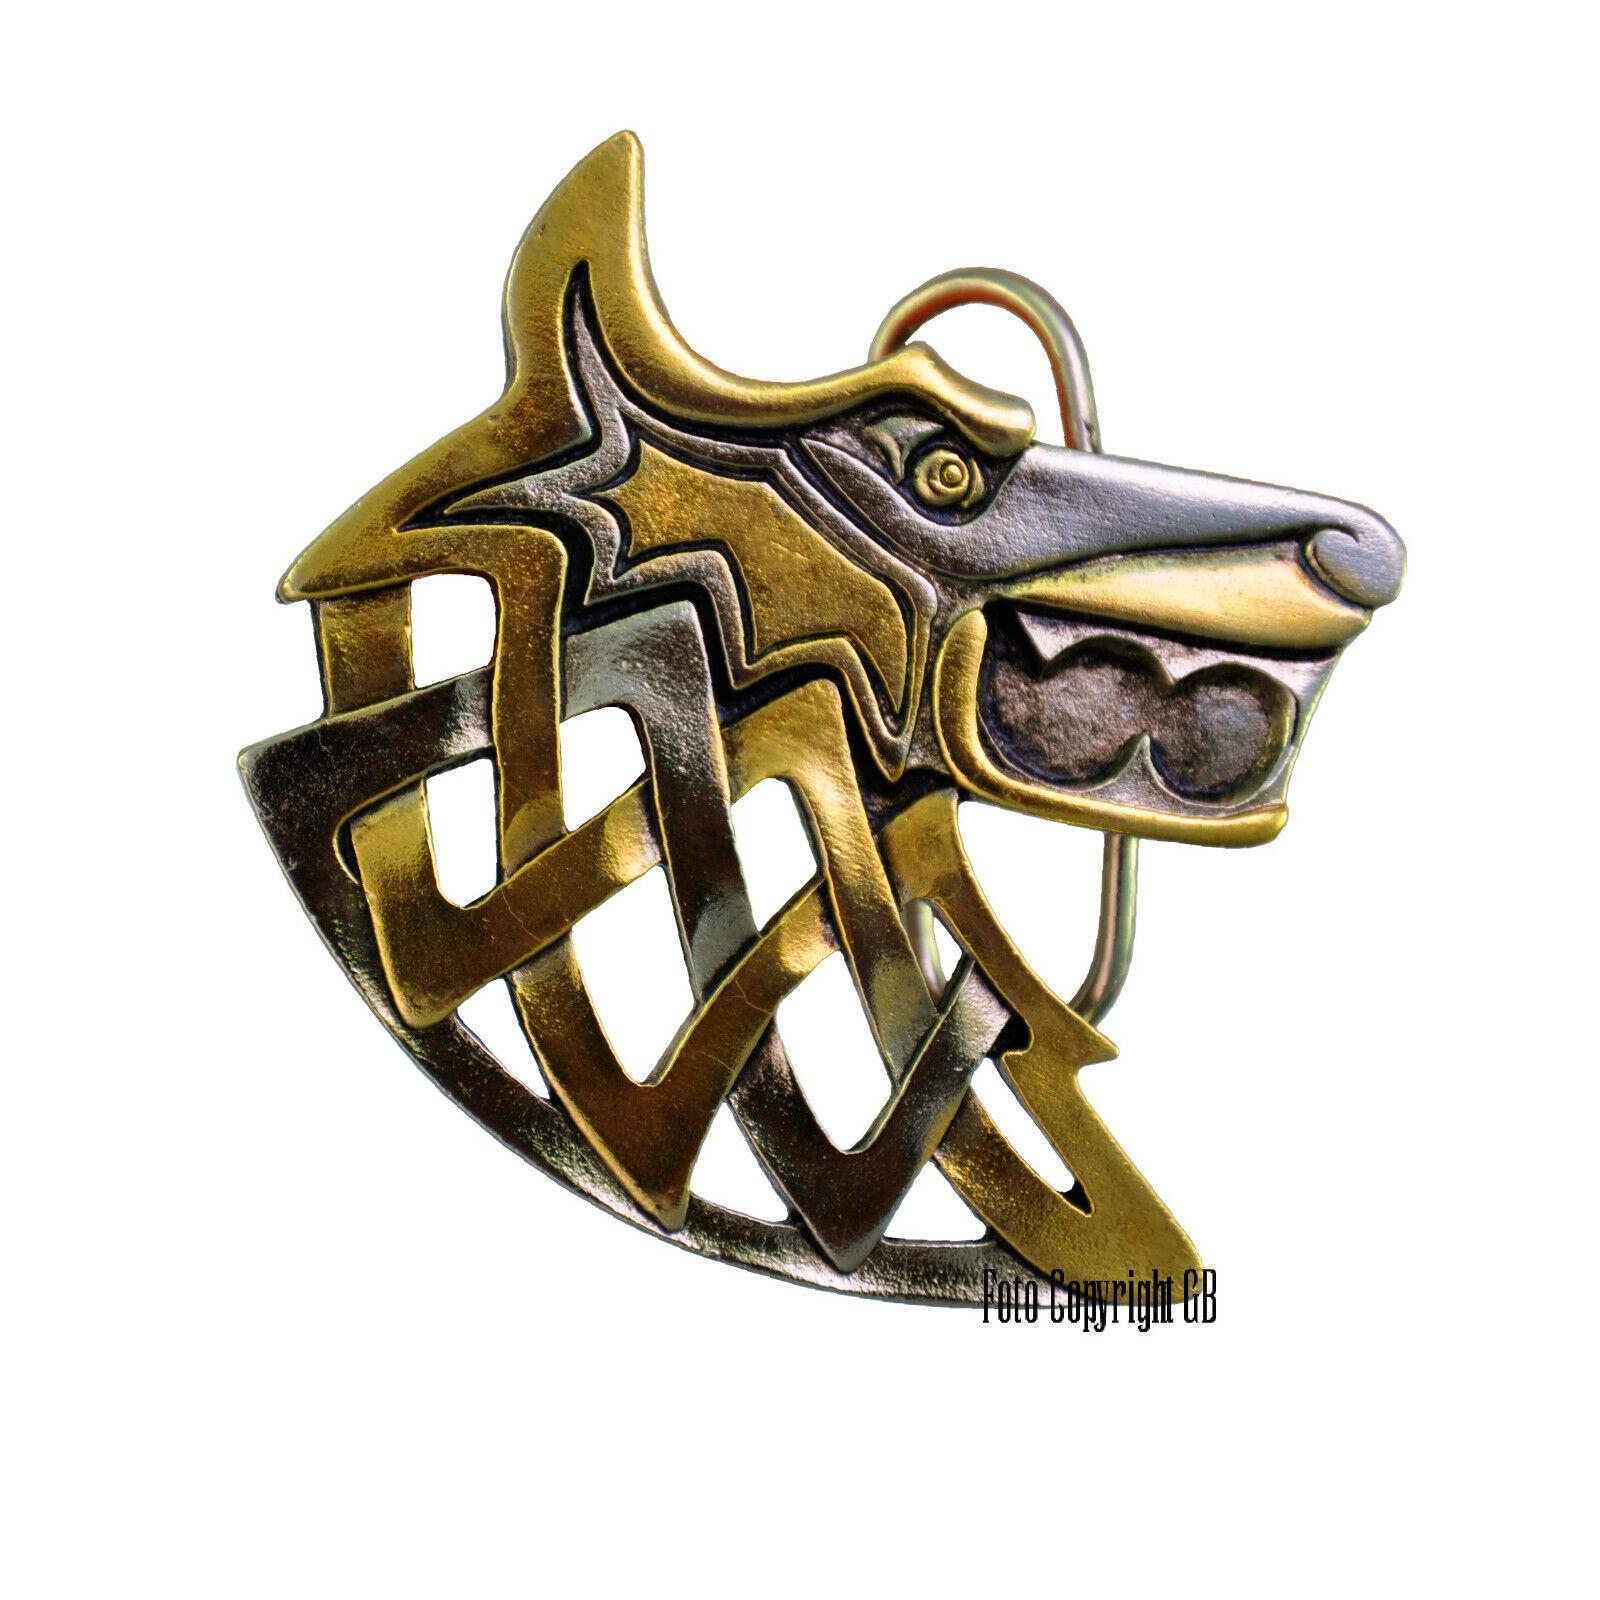 Wolf Buckle Tribal Wikinger Mittelalter Gürtelschnalle Keltisch *425 gold